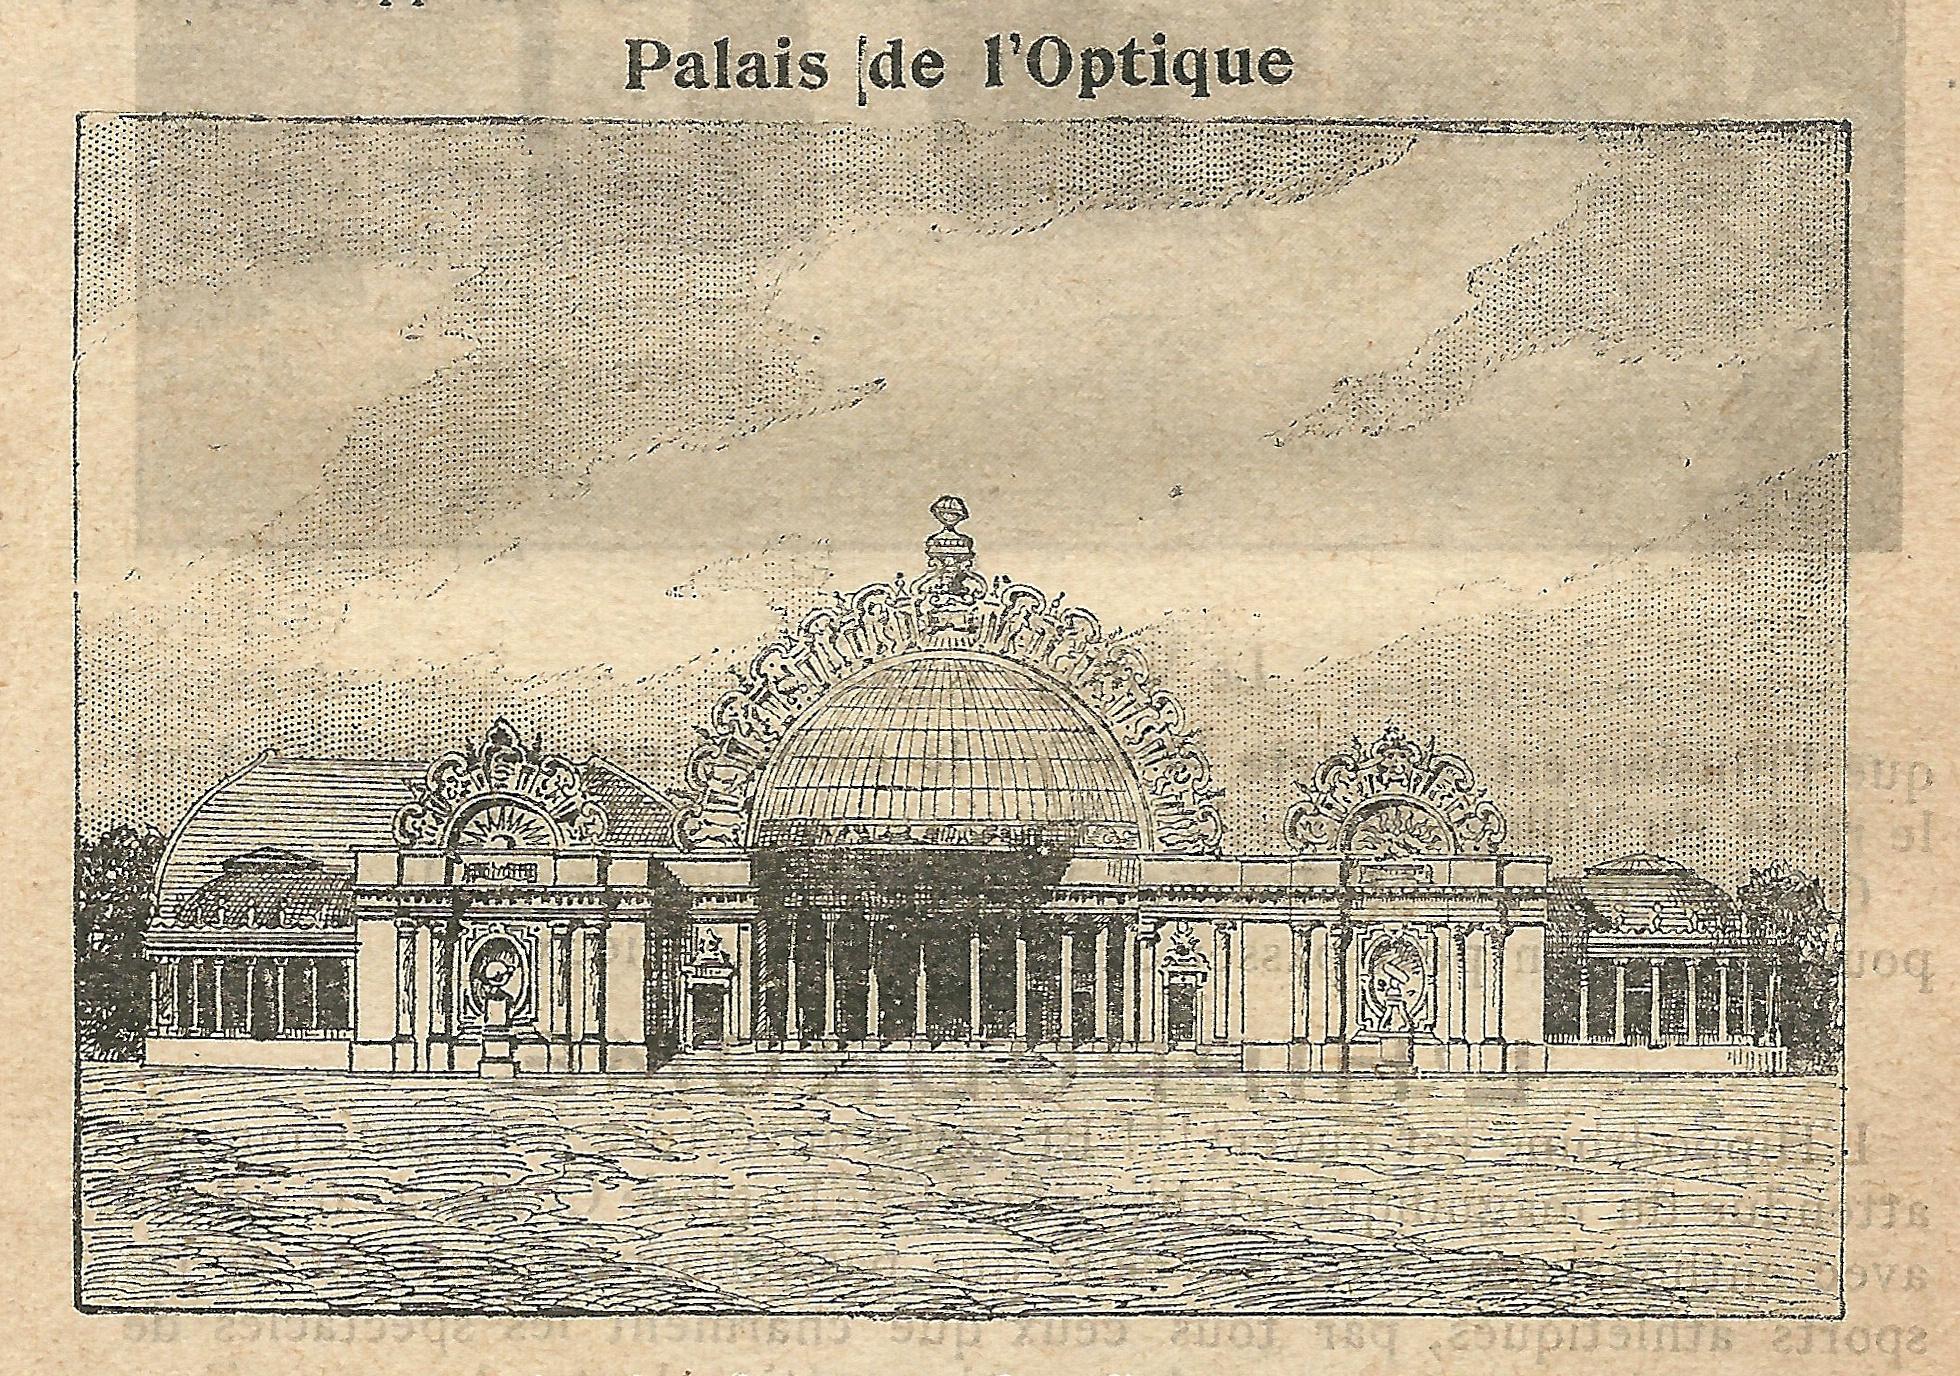 File Expo 1900-Palais de l Optique.jpg - Wikimedia Commons b71f7edc7e3f